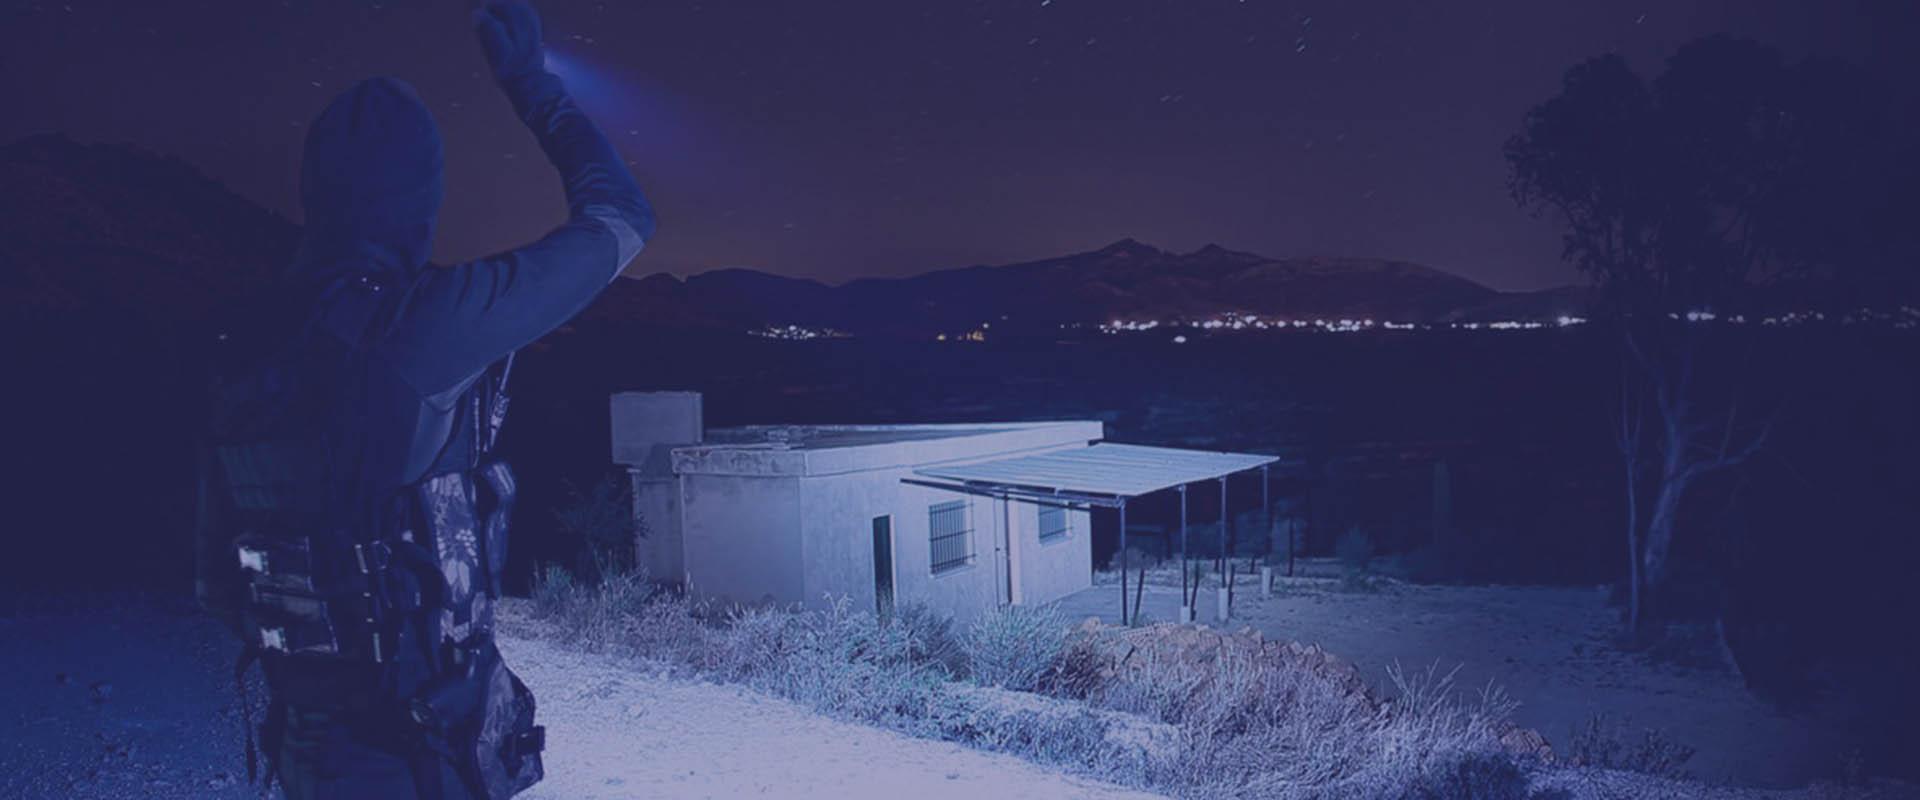 high lumen flashlight